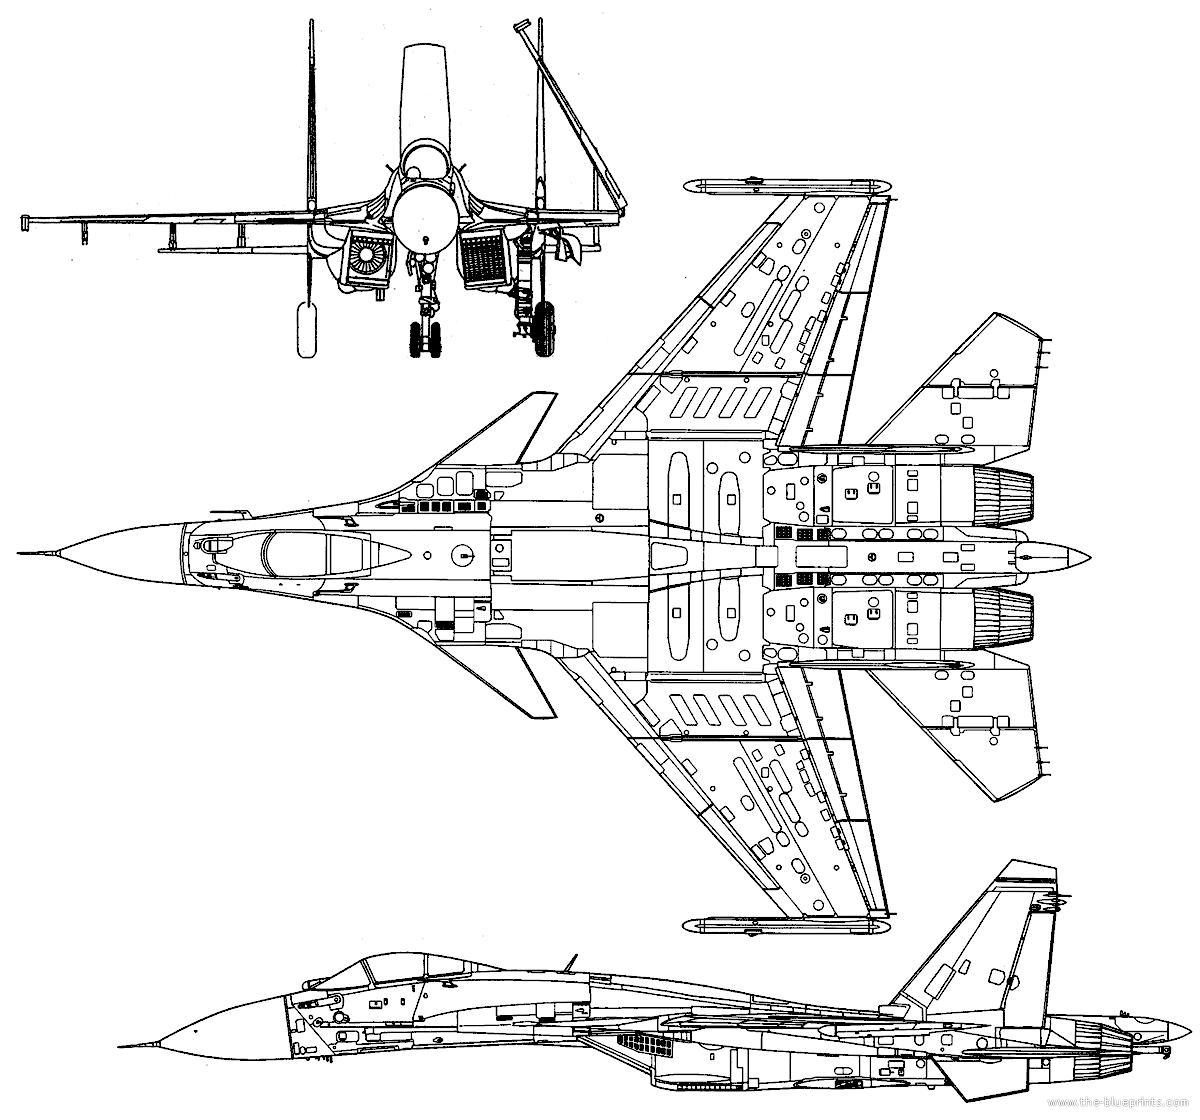 Su-33 Flanker-D (Su-27K)